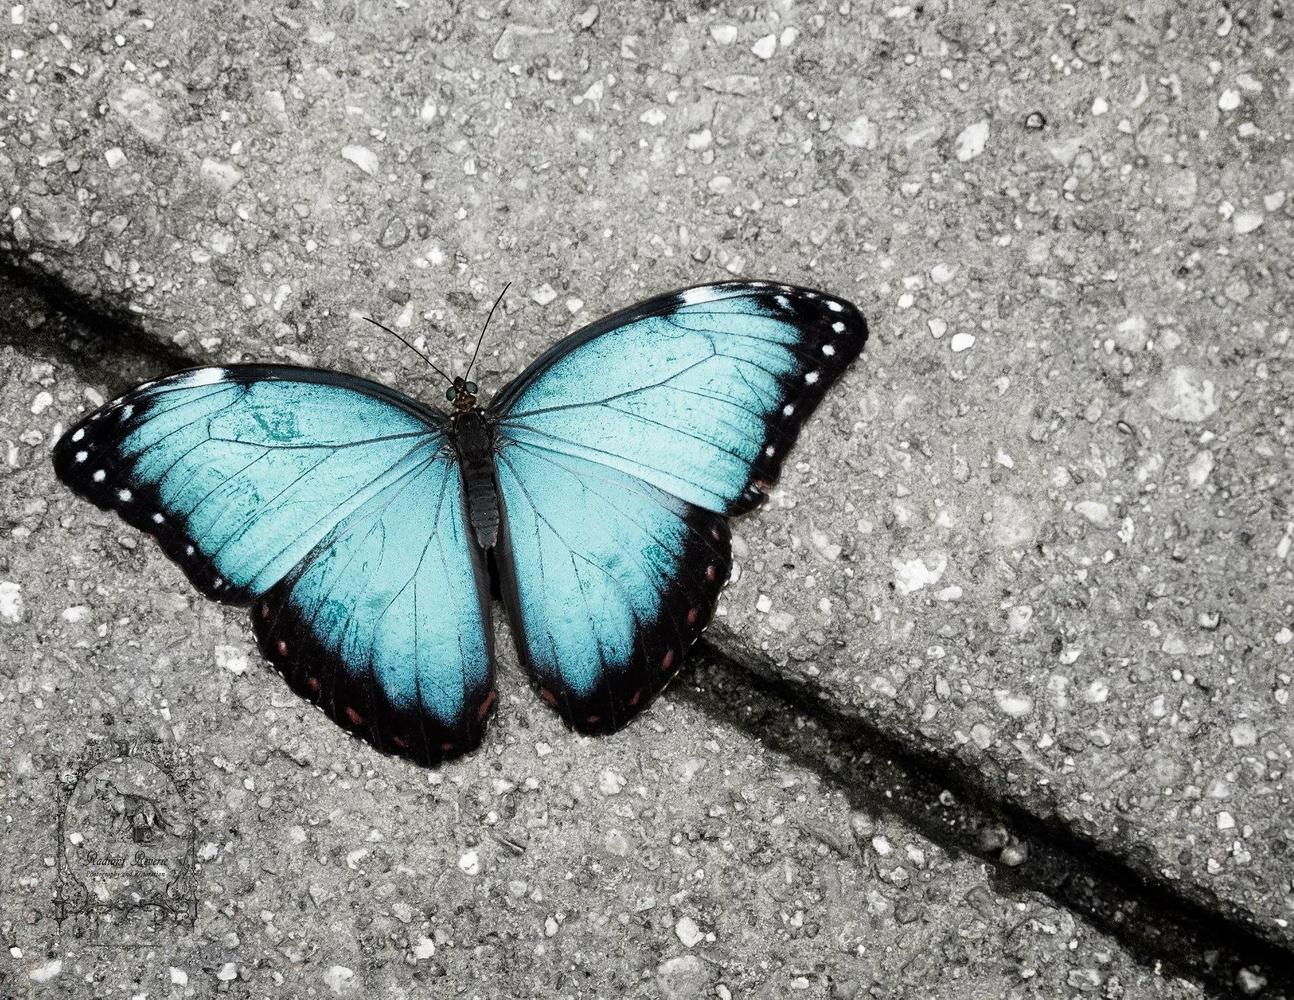 Blue Beauty by Audree Rodabaugh